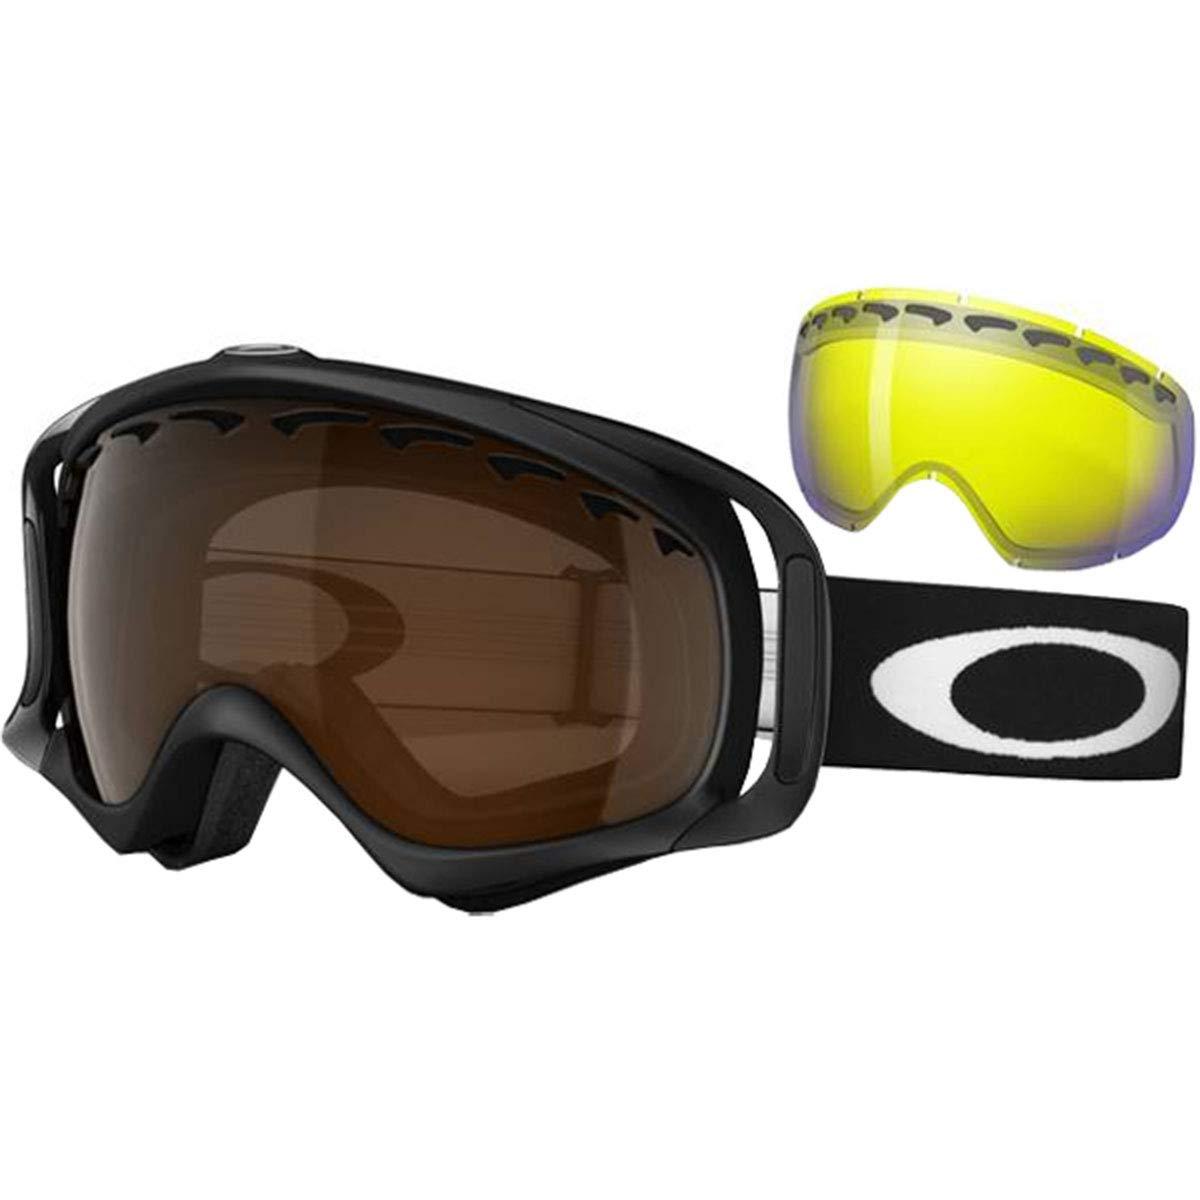 979e7067044 Amazon.com  Oakley Crowbar Matte Adult Snowmobile Goggles - Black ...